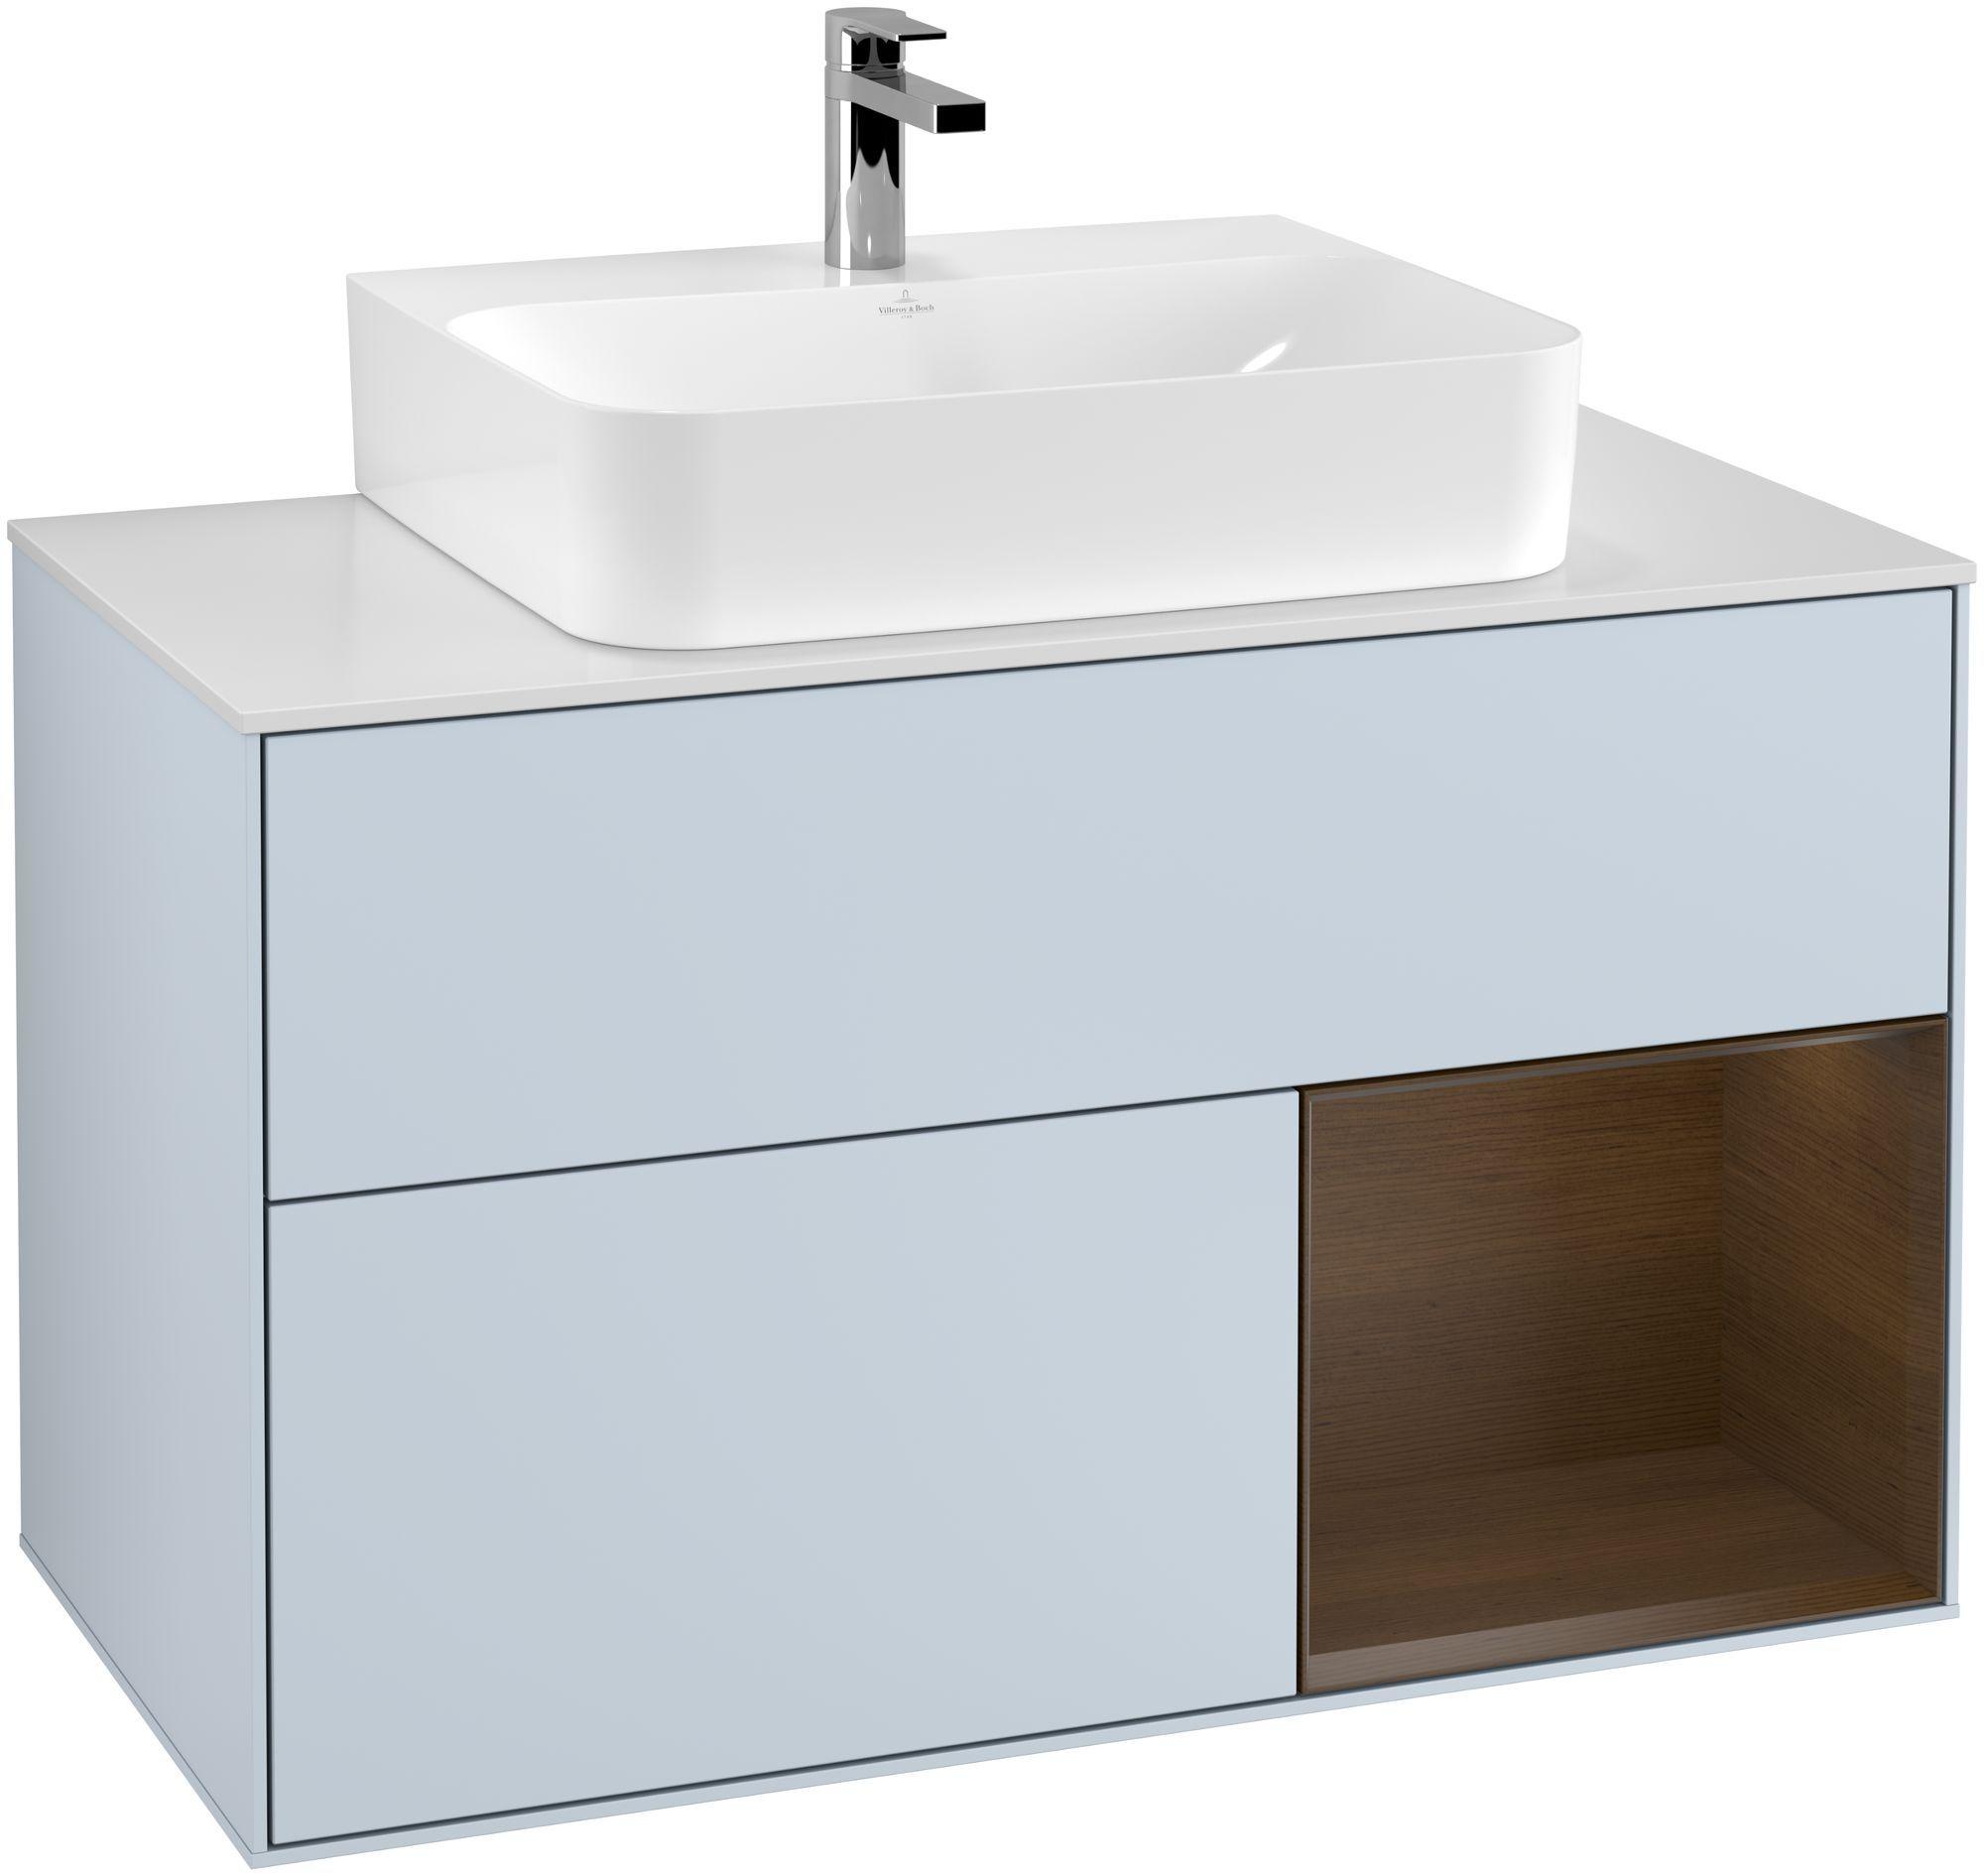 Villeroy & Boch Finion F12 Waschtischunterschrank mit Regalelement 2 Auszüge Waschtisch mittig LED-Beleuchtung B:100xH:60,3xT:50,1cm Front, Korpus: Cloud, Regal: Walnut Veneer, Glasplatte: White Matt F121GNHA